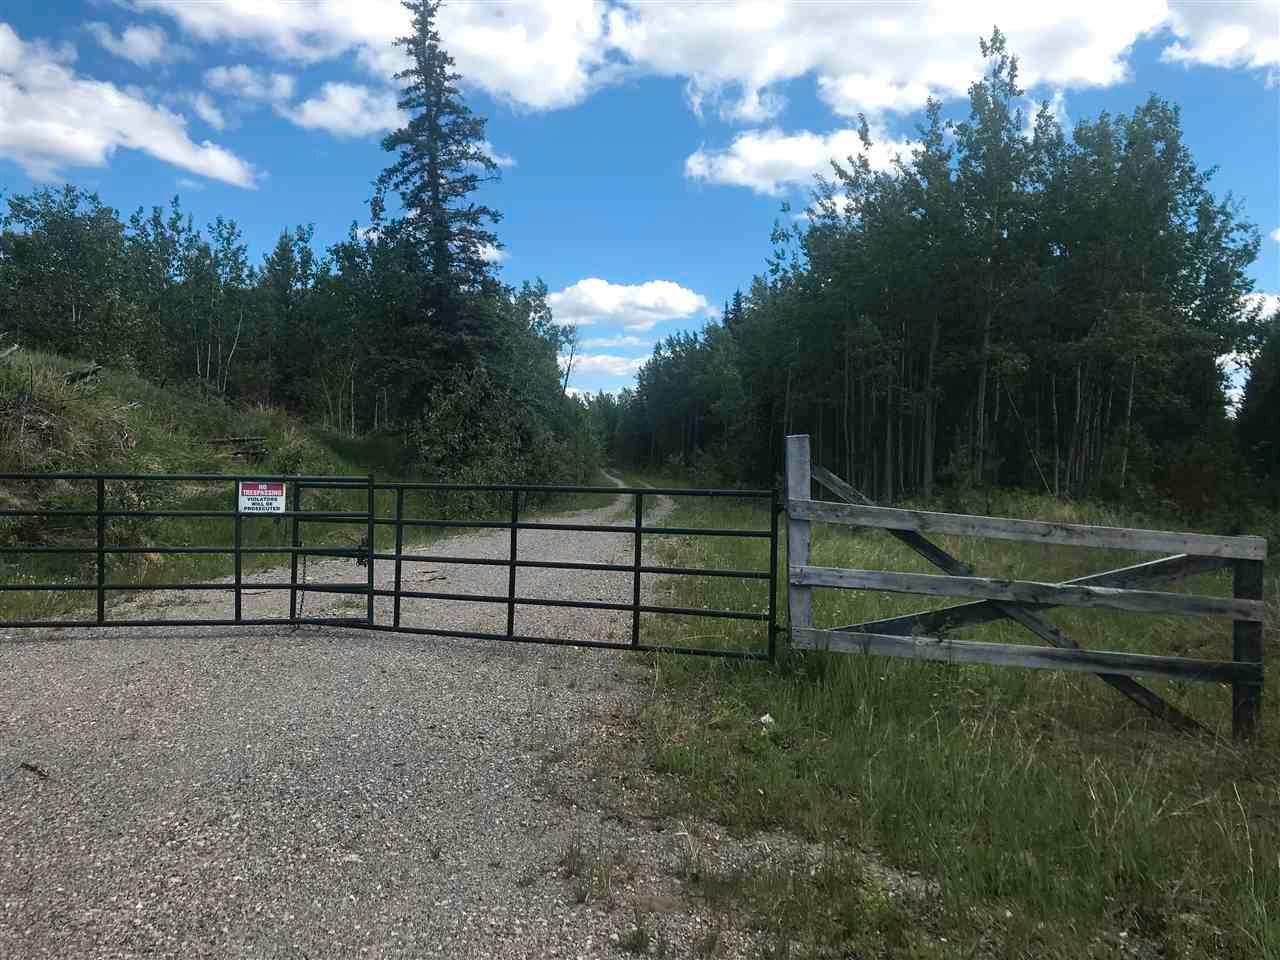 Main Photo: 20877 DREW Road: Hudsons Hope Land for sale (Fort St. John (Zone 60))  : MLS®# R2591770